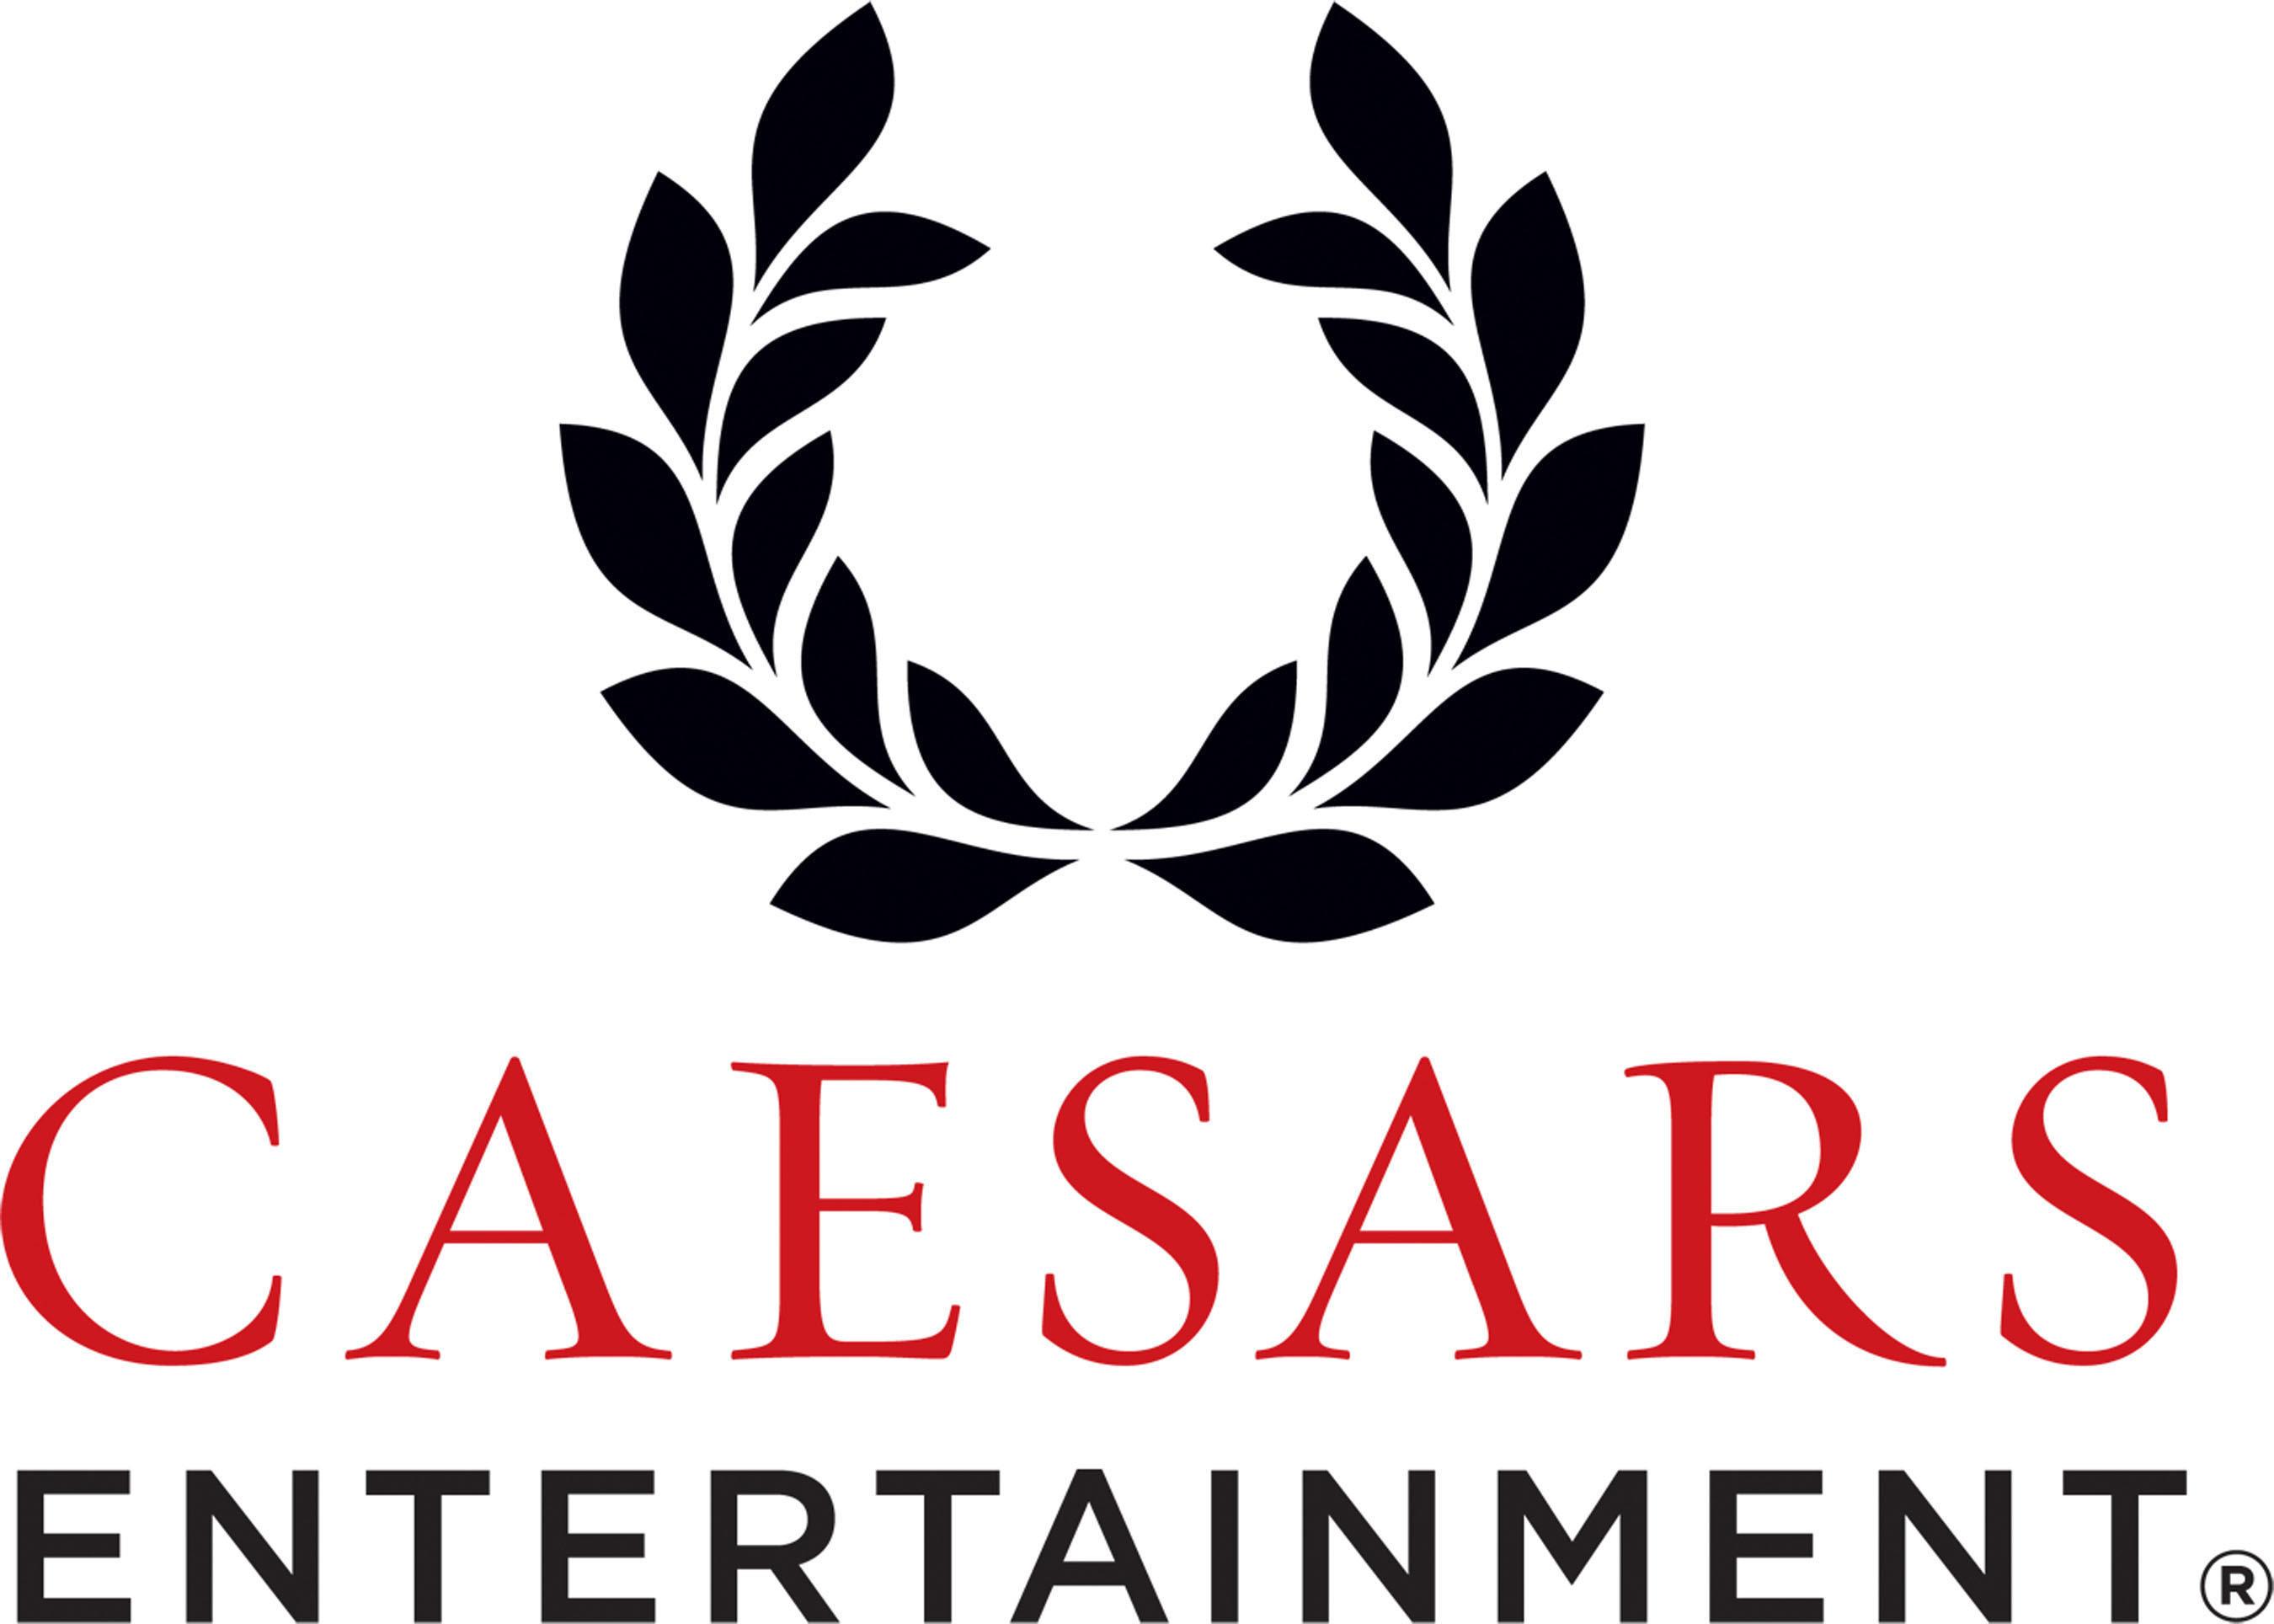 Caesars Entertainment Corporation logo. (PRNewsFoto/Caesars Entertainment Corporation)